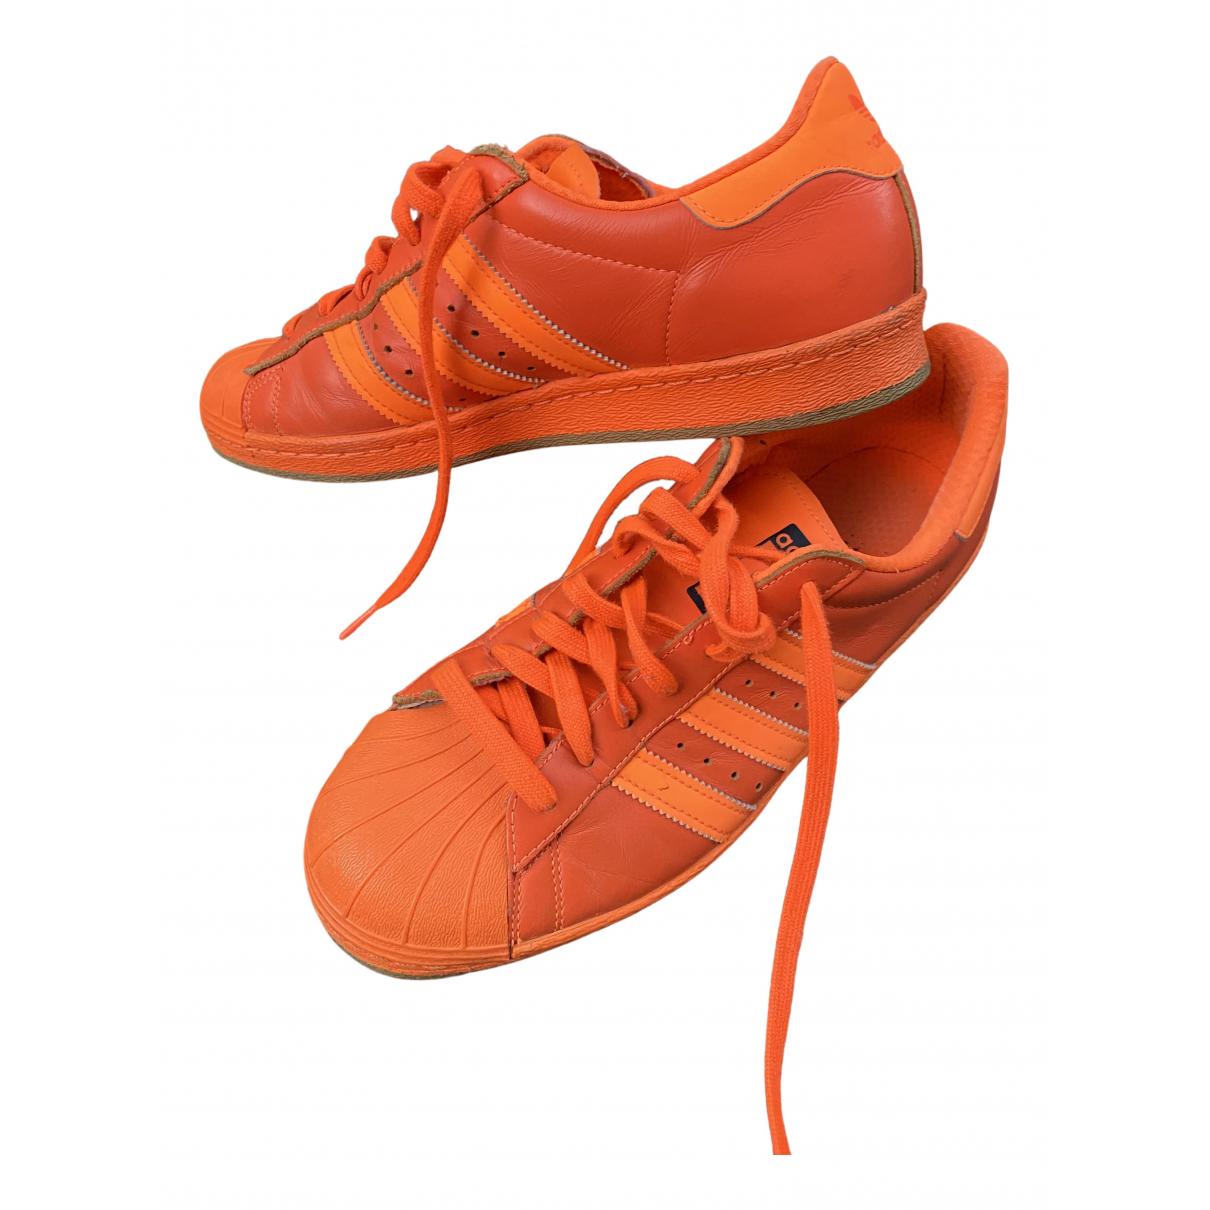 Adidas - Baskets Superstar pour homme en cuir - orange